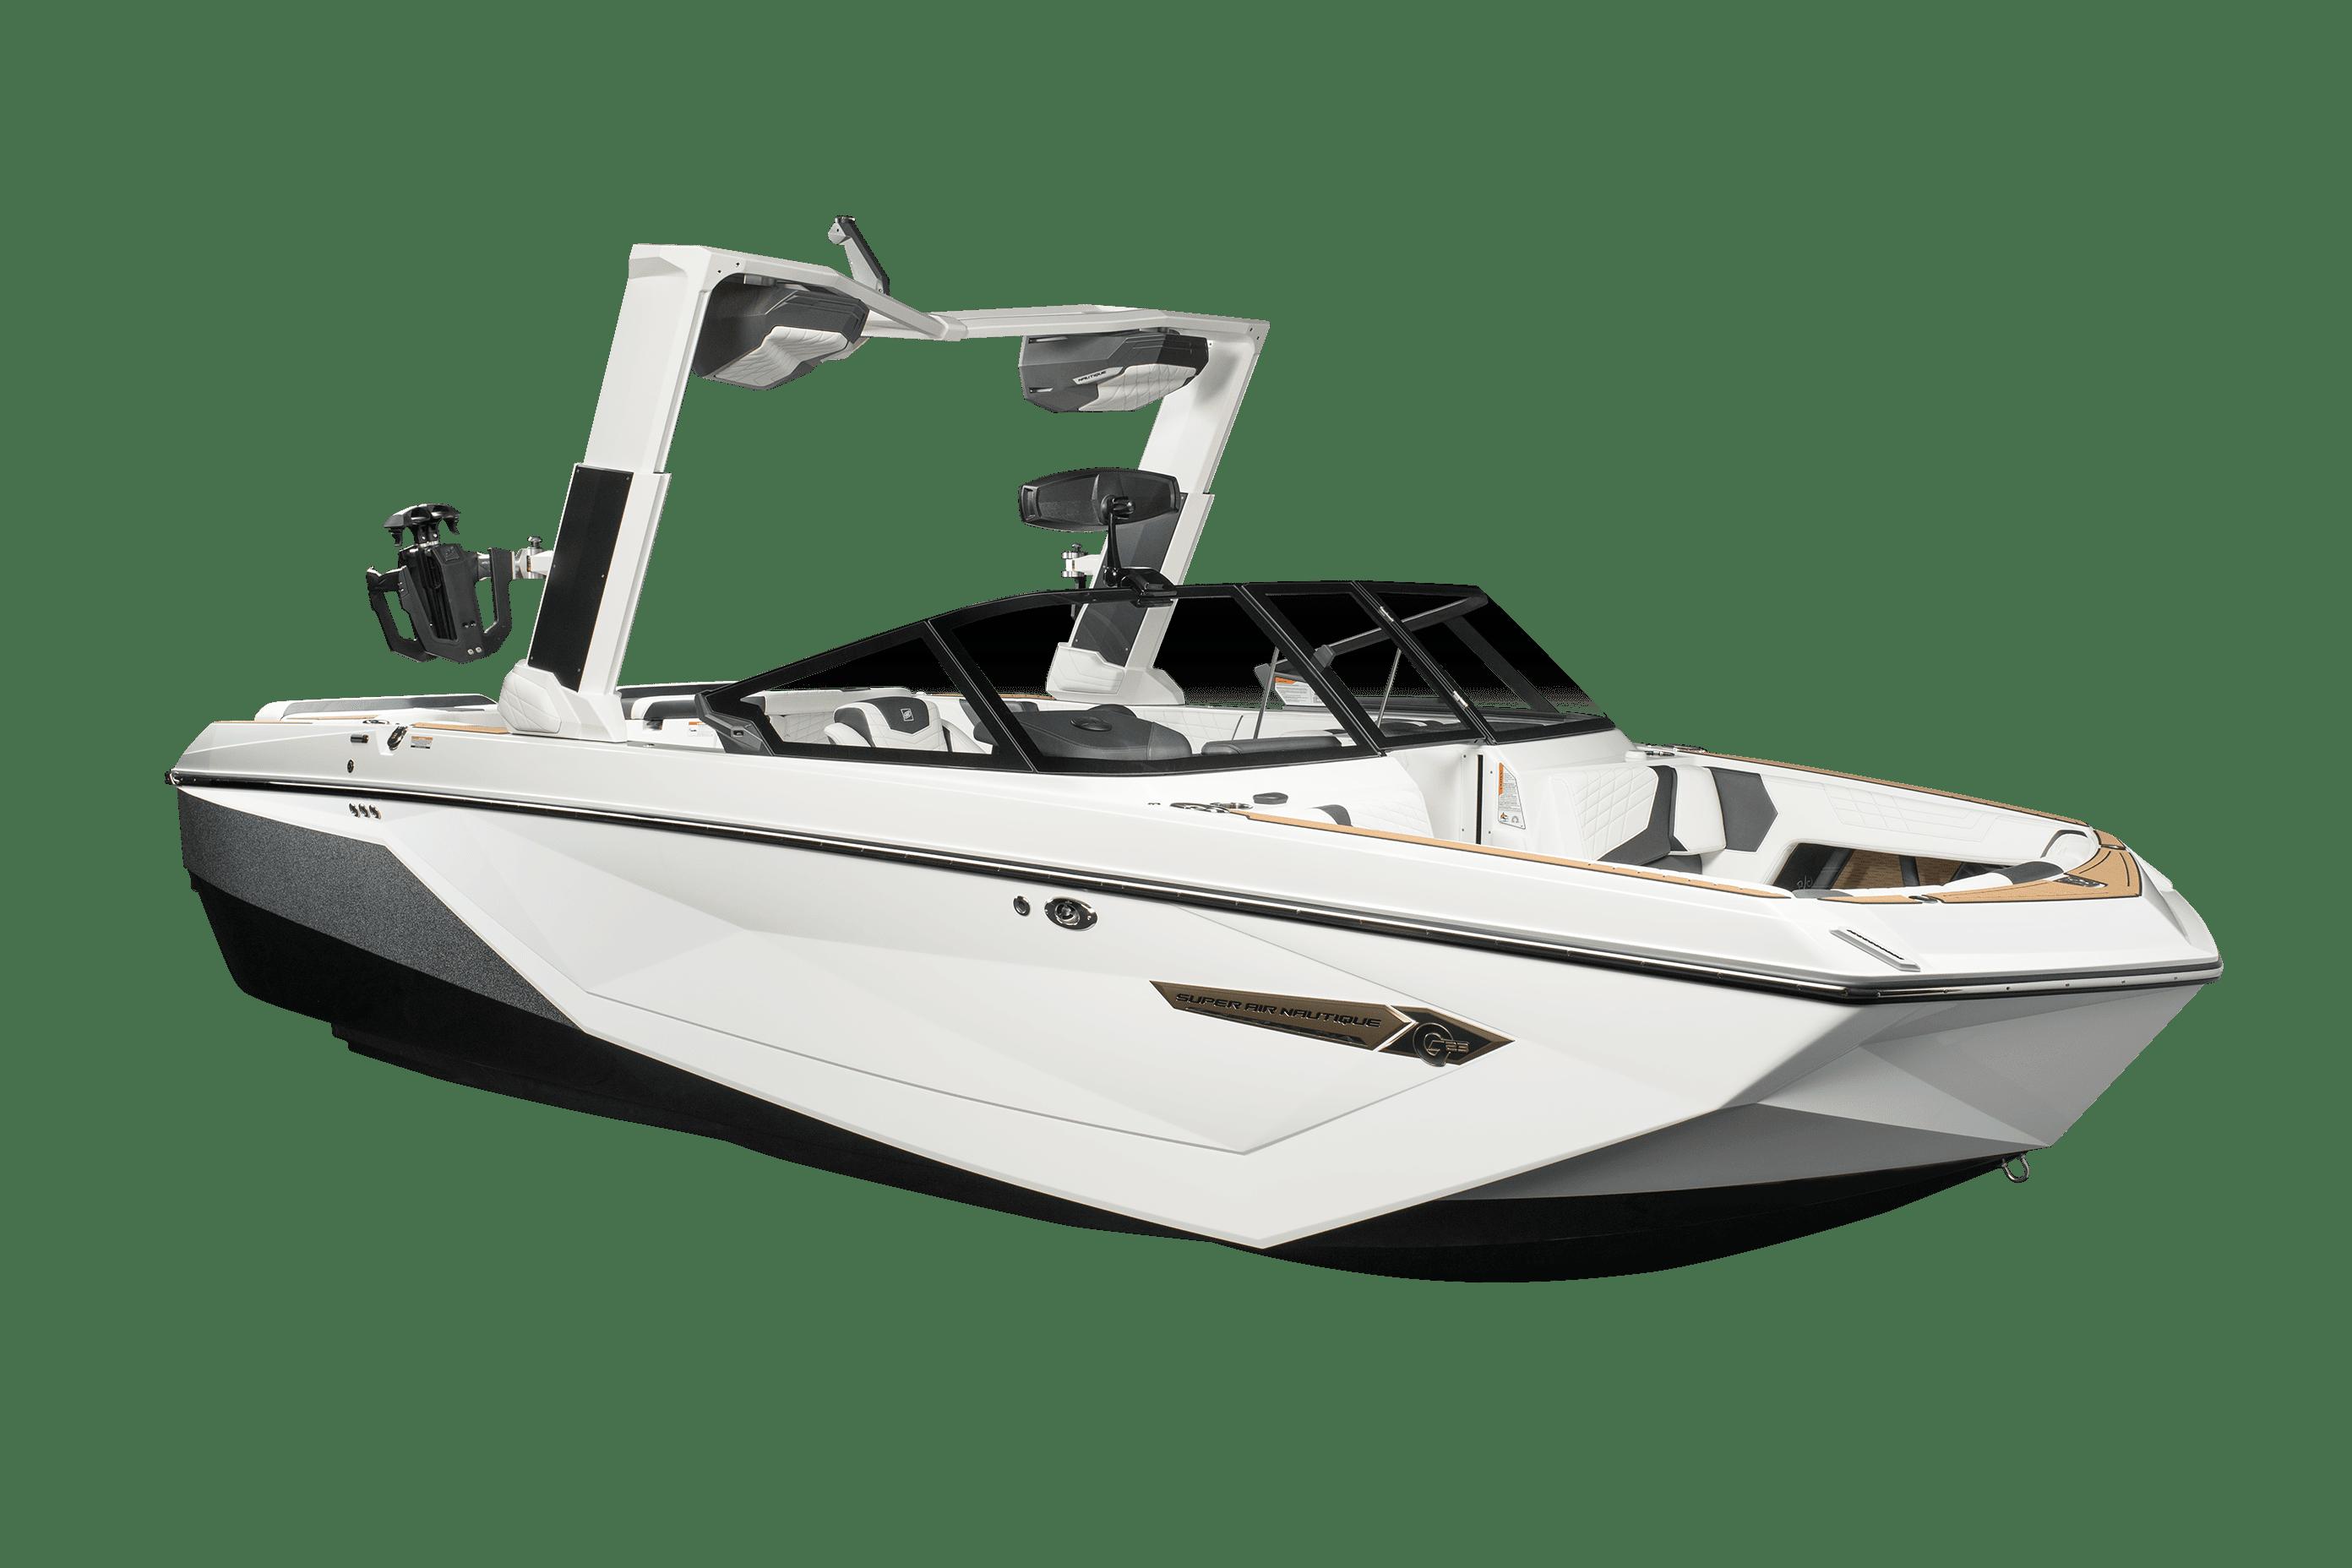 סירת ספורט וויקסרף וויקבורד NAUTIQUE G23 - סטרים יאכטות